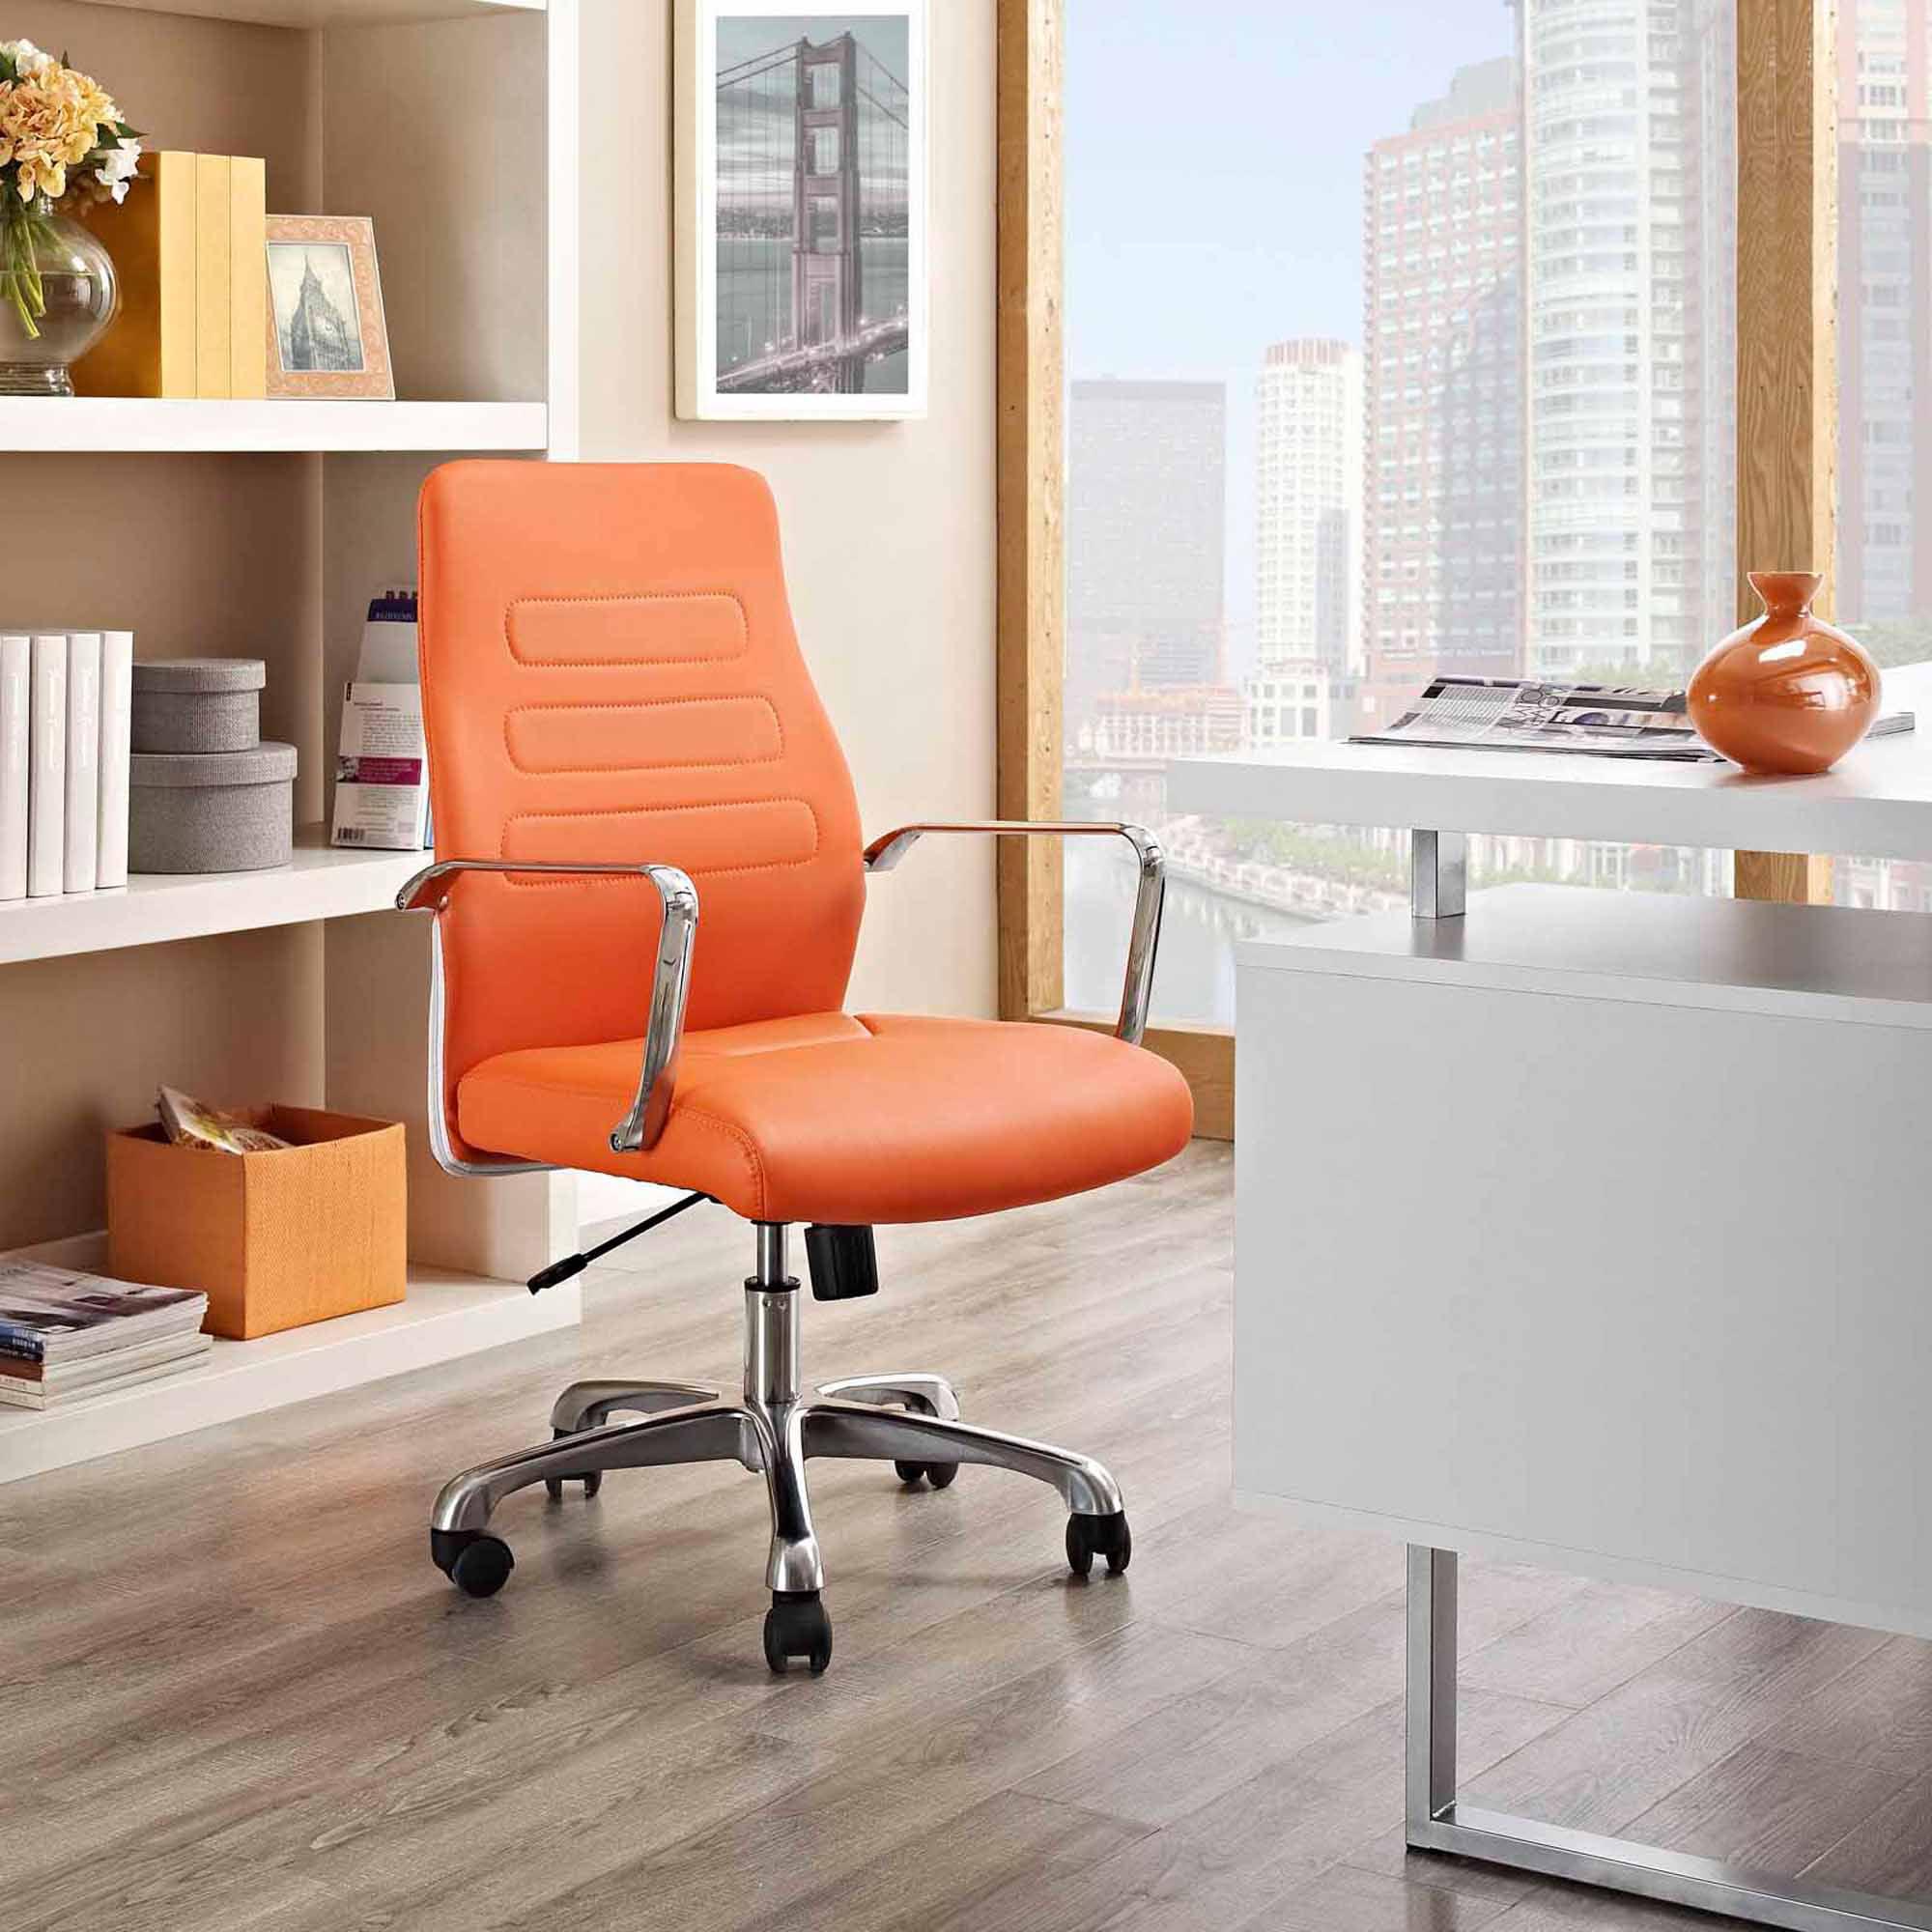 Modway Depict Mid Back Aluminum Office Chair, Multiple Colors